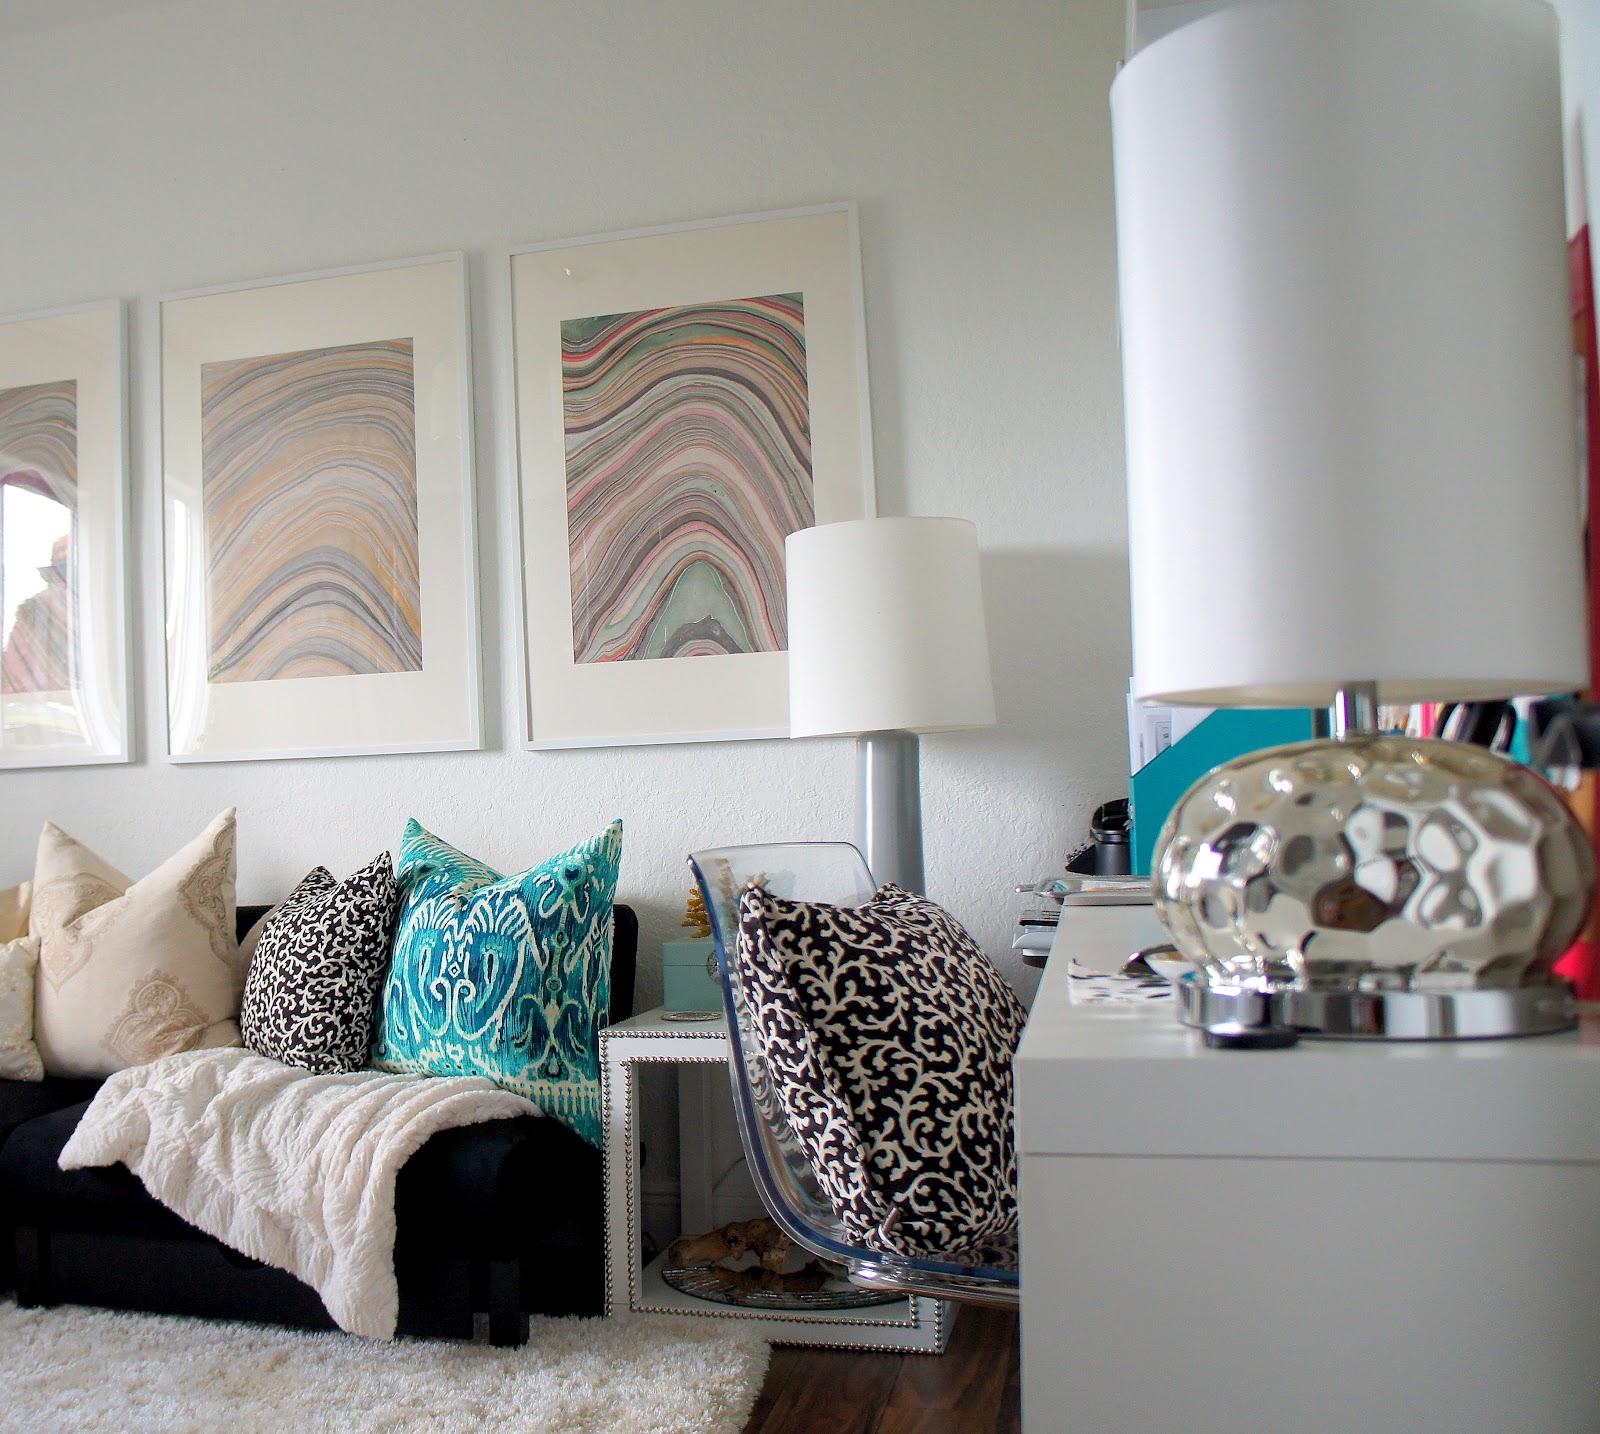 Guest Room Ideas With Futon Living Room Interior Designs